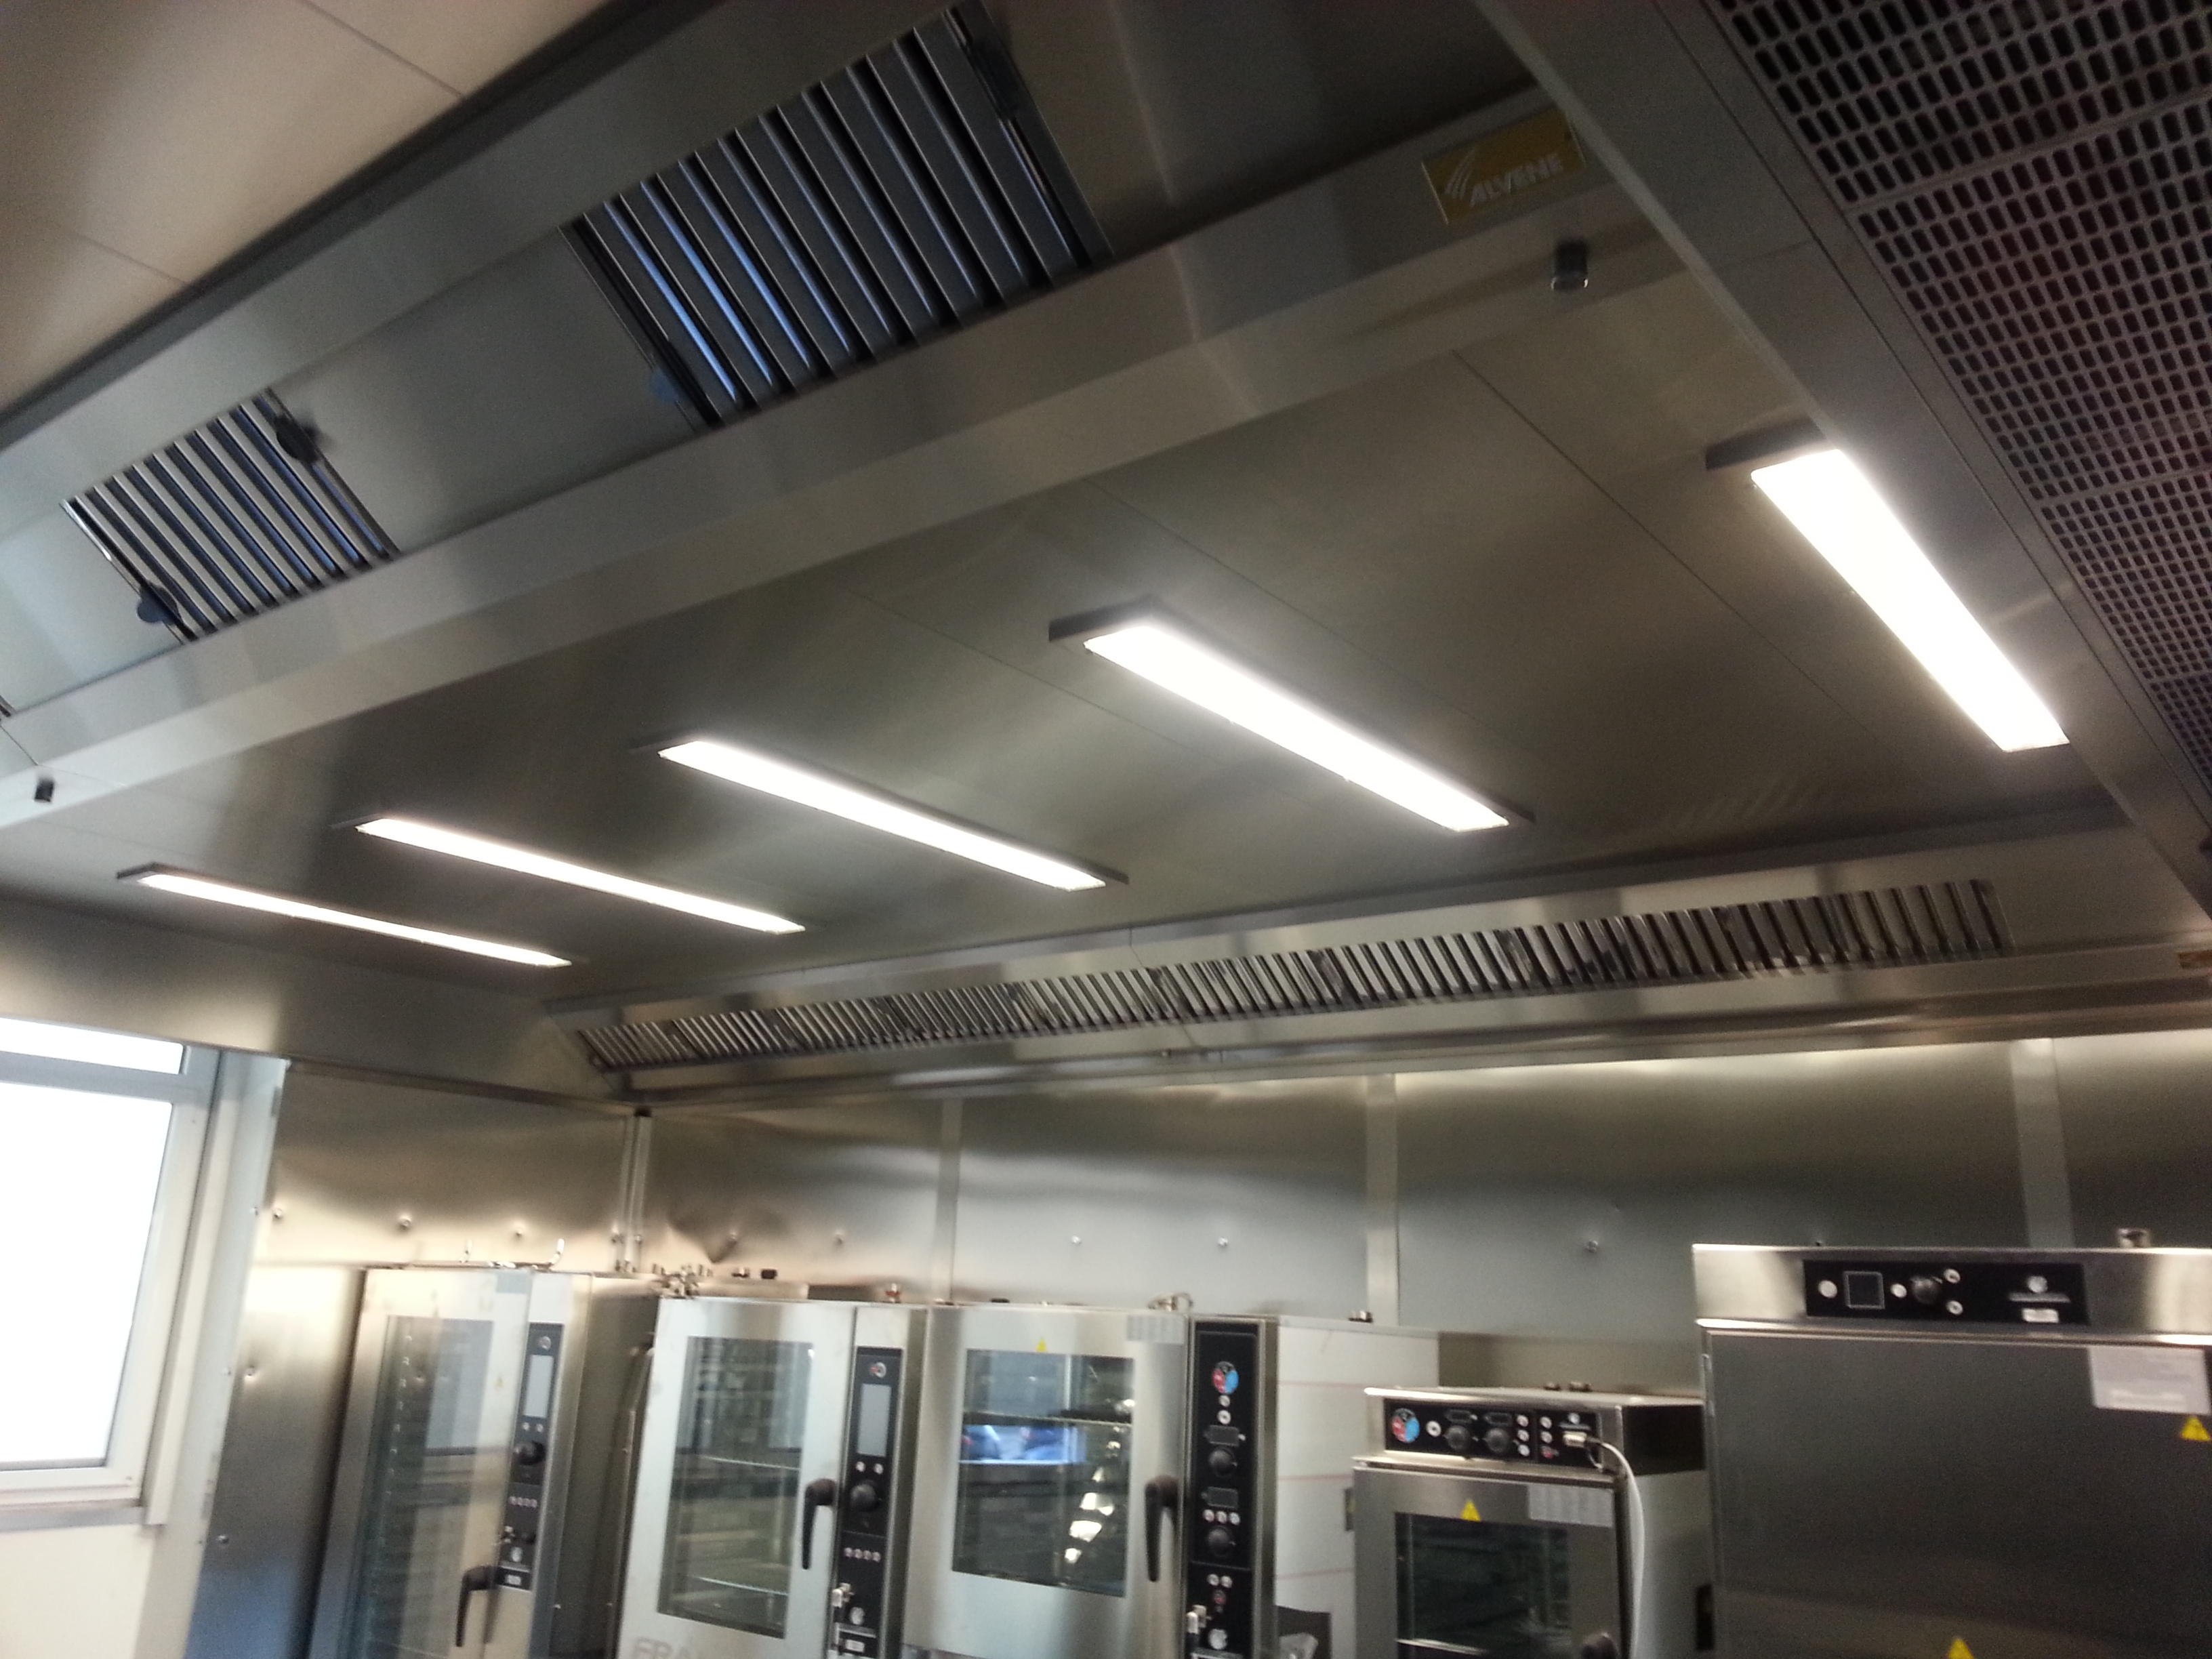 systeme d'extraction a plafond filtrant - cuisines professionnelles